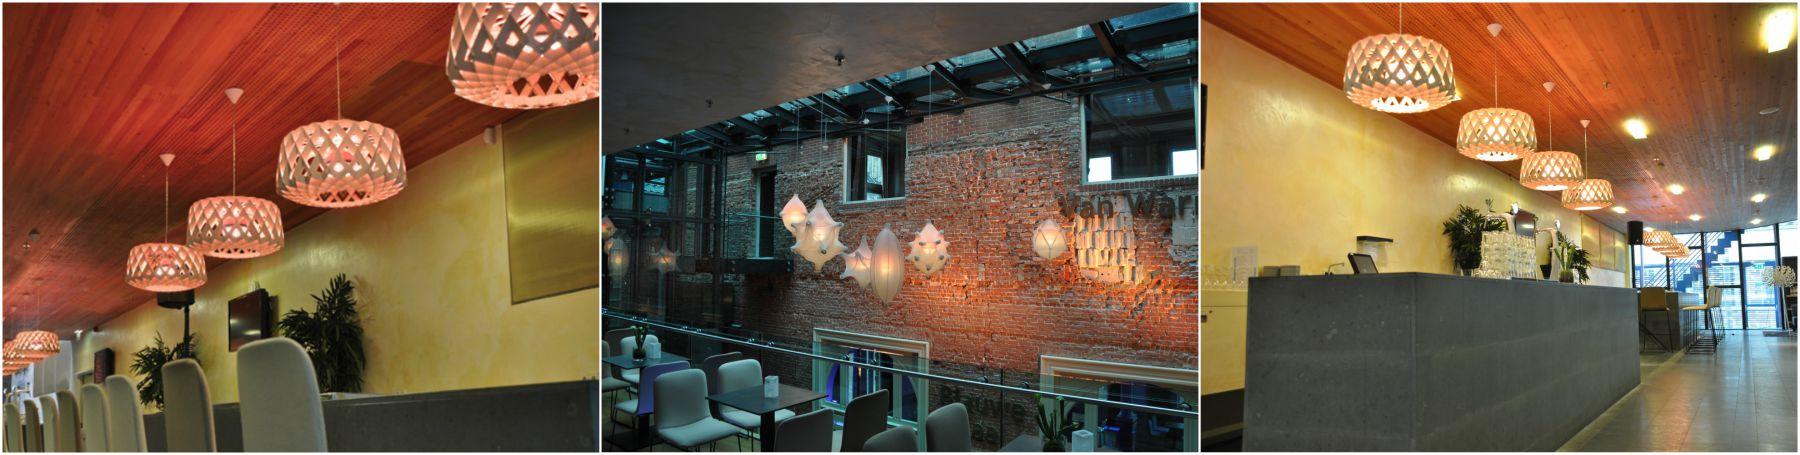 Bar&entreePhilharmonie_collage1